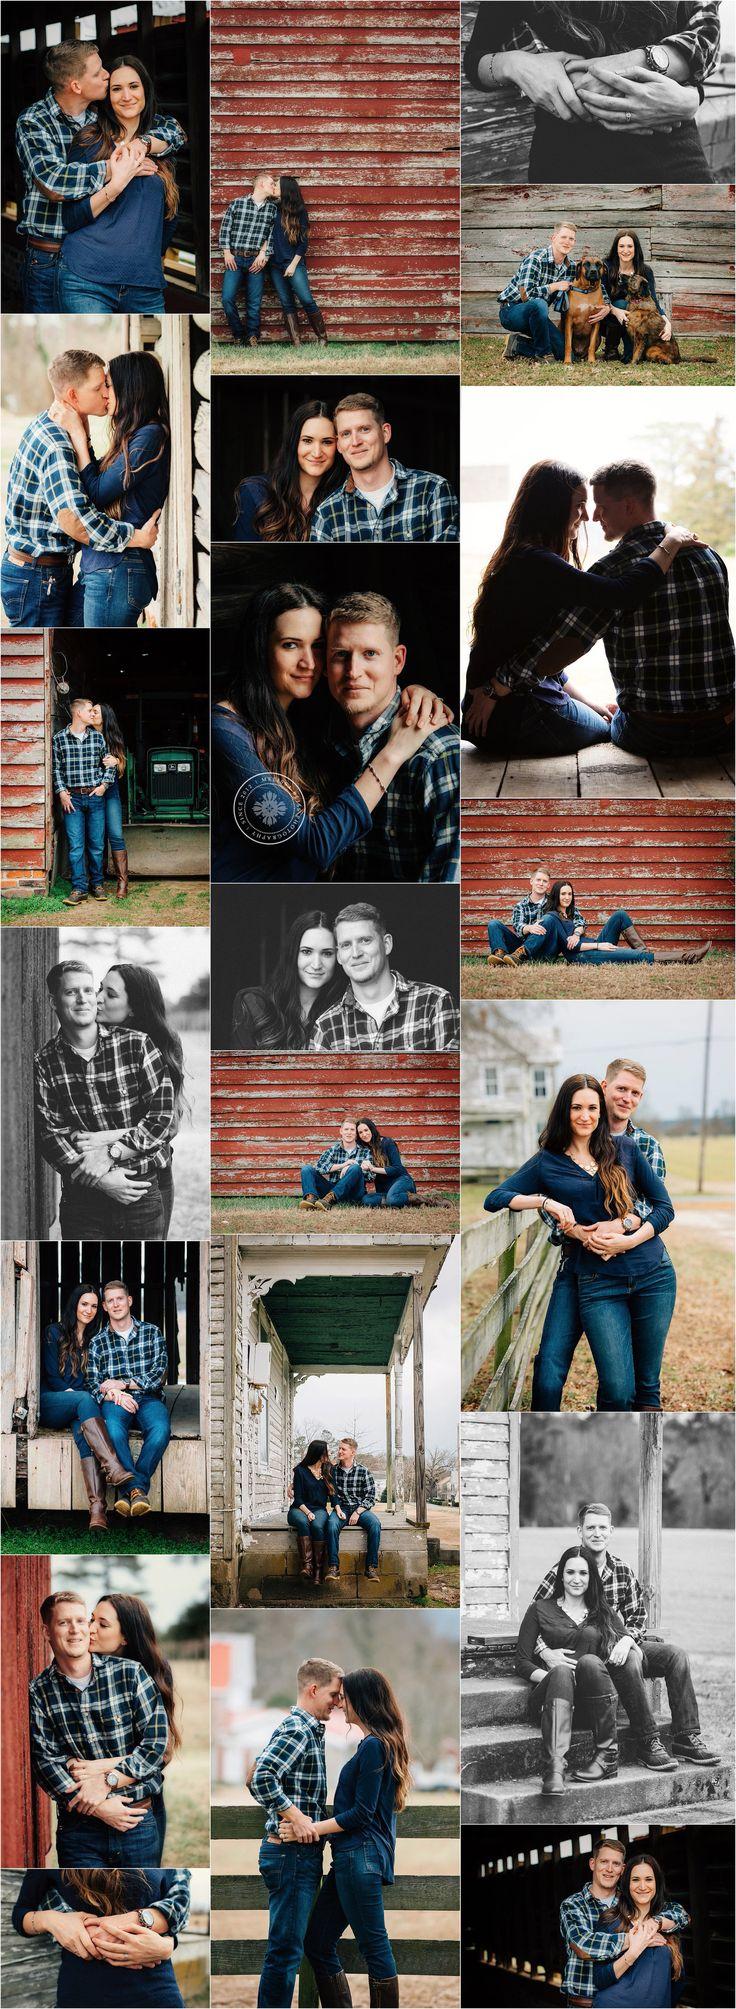 engagment-photography-ideas-engagement-posing-rustic-barn-engagement-session-photography-couples-norfolk-virginia-beach-photographer